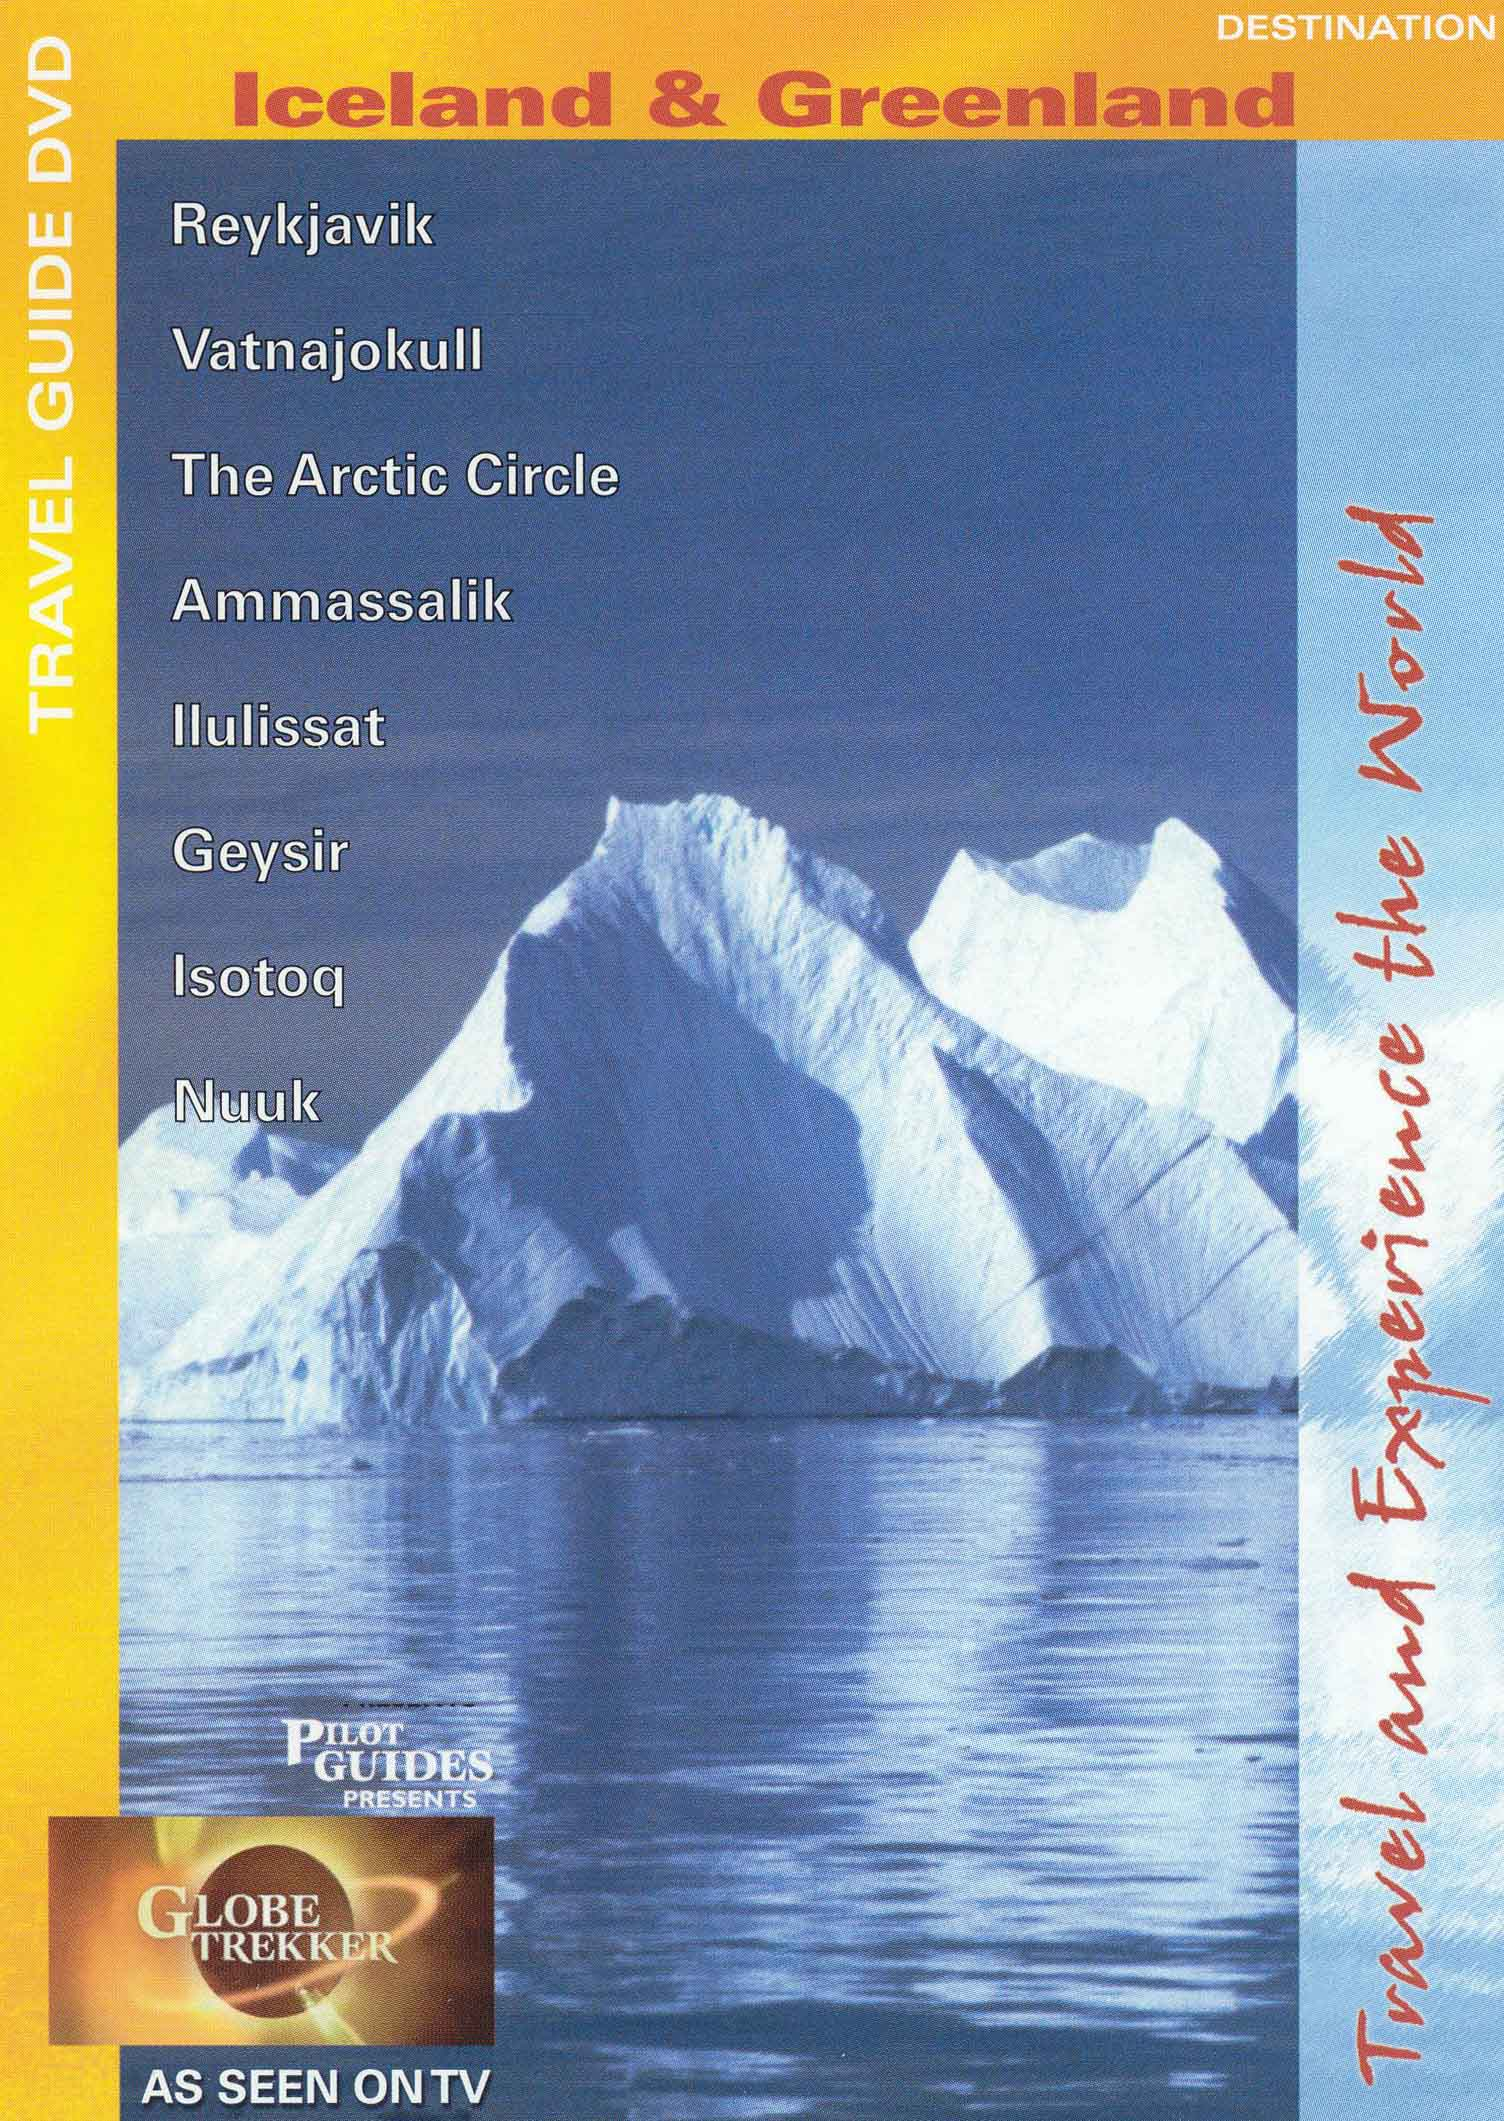 Globe Trekker: Iceland and Greenland